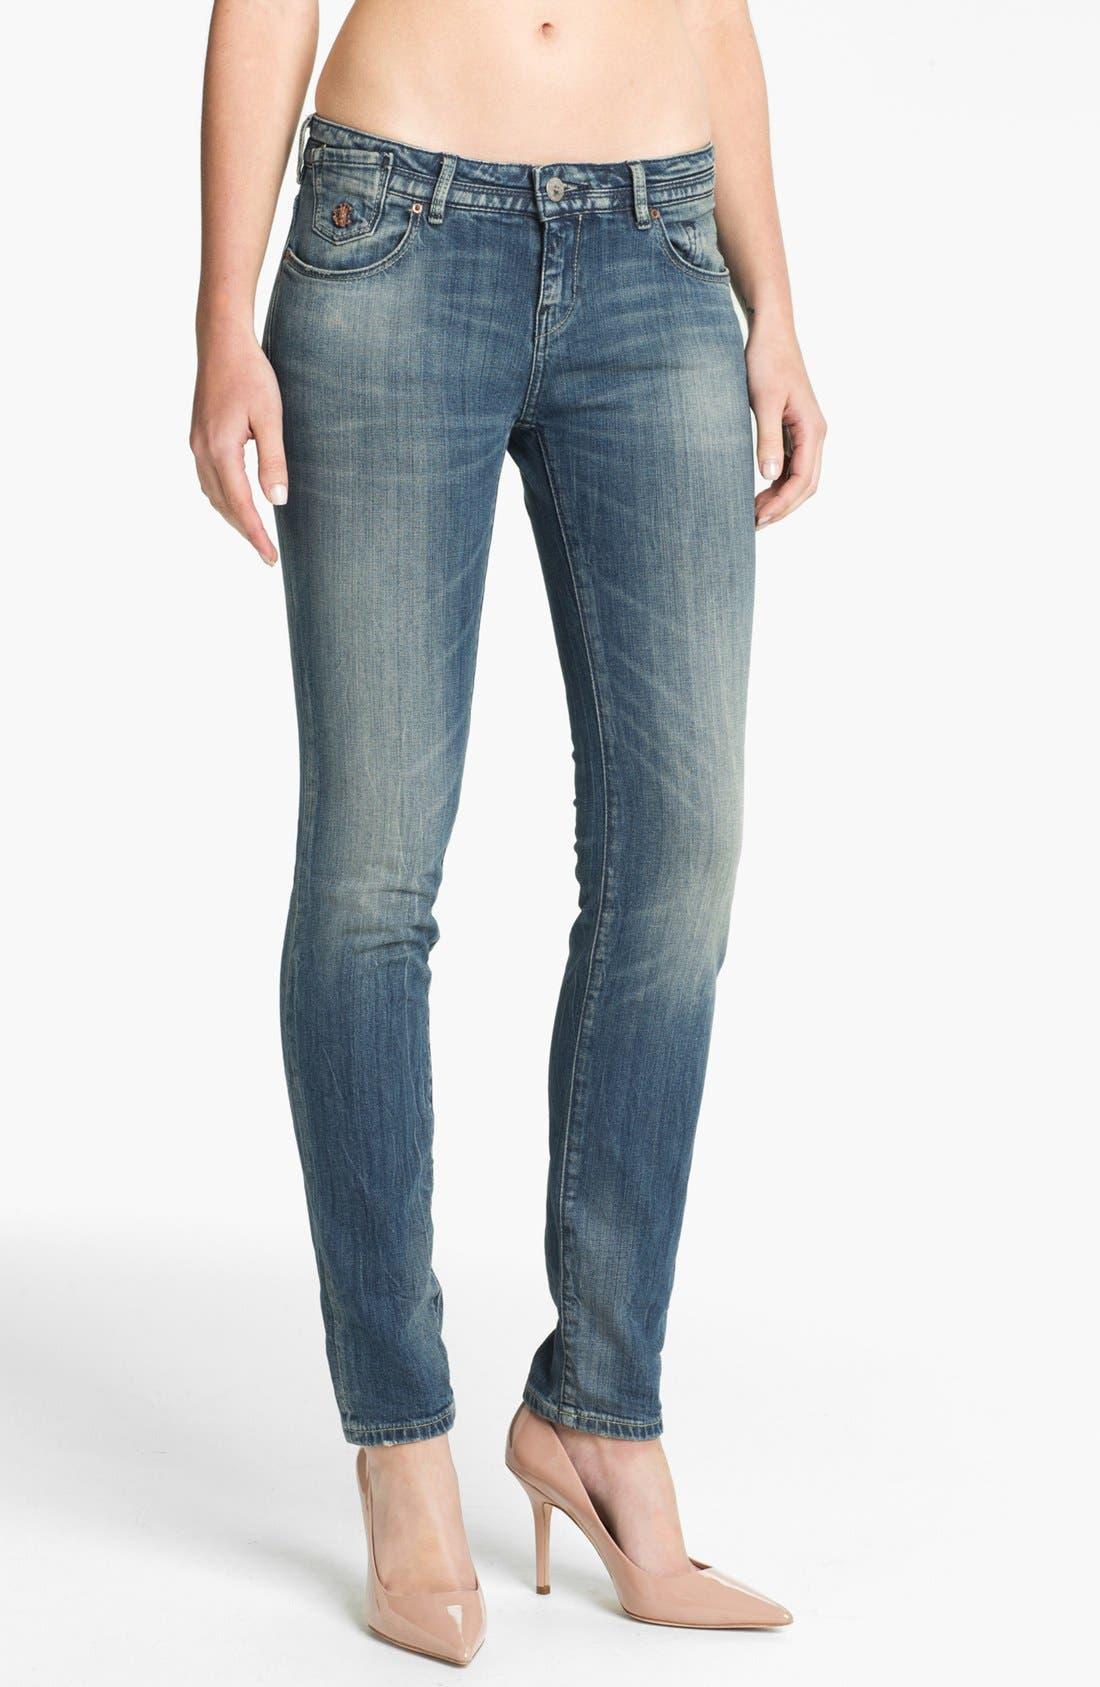 Main Image - Maison Scotch 'La Parisienne' Bleach Washed Skinny Jeans (Bleutiful)